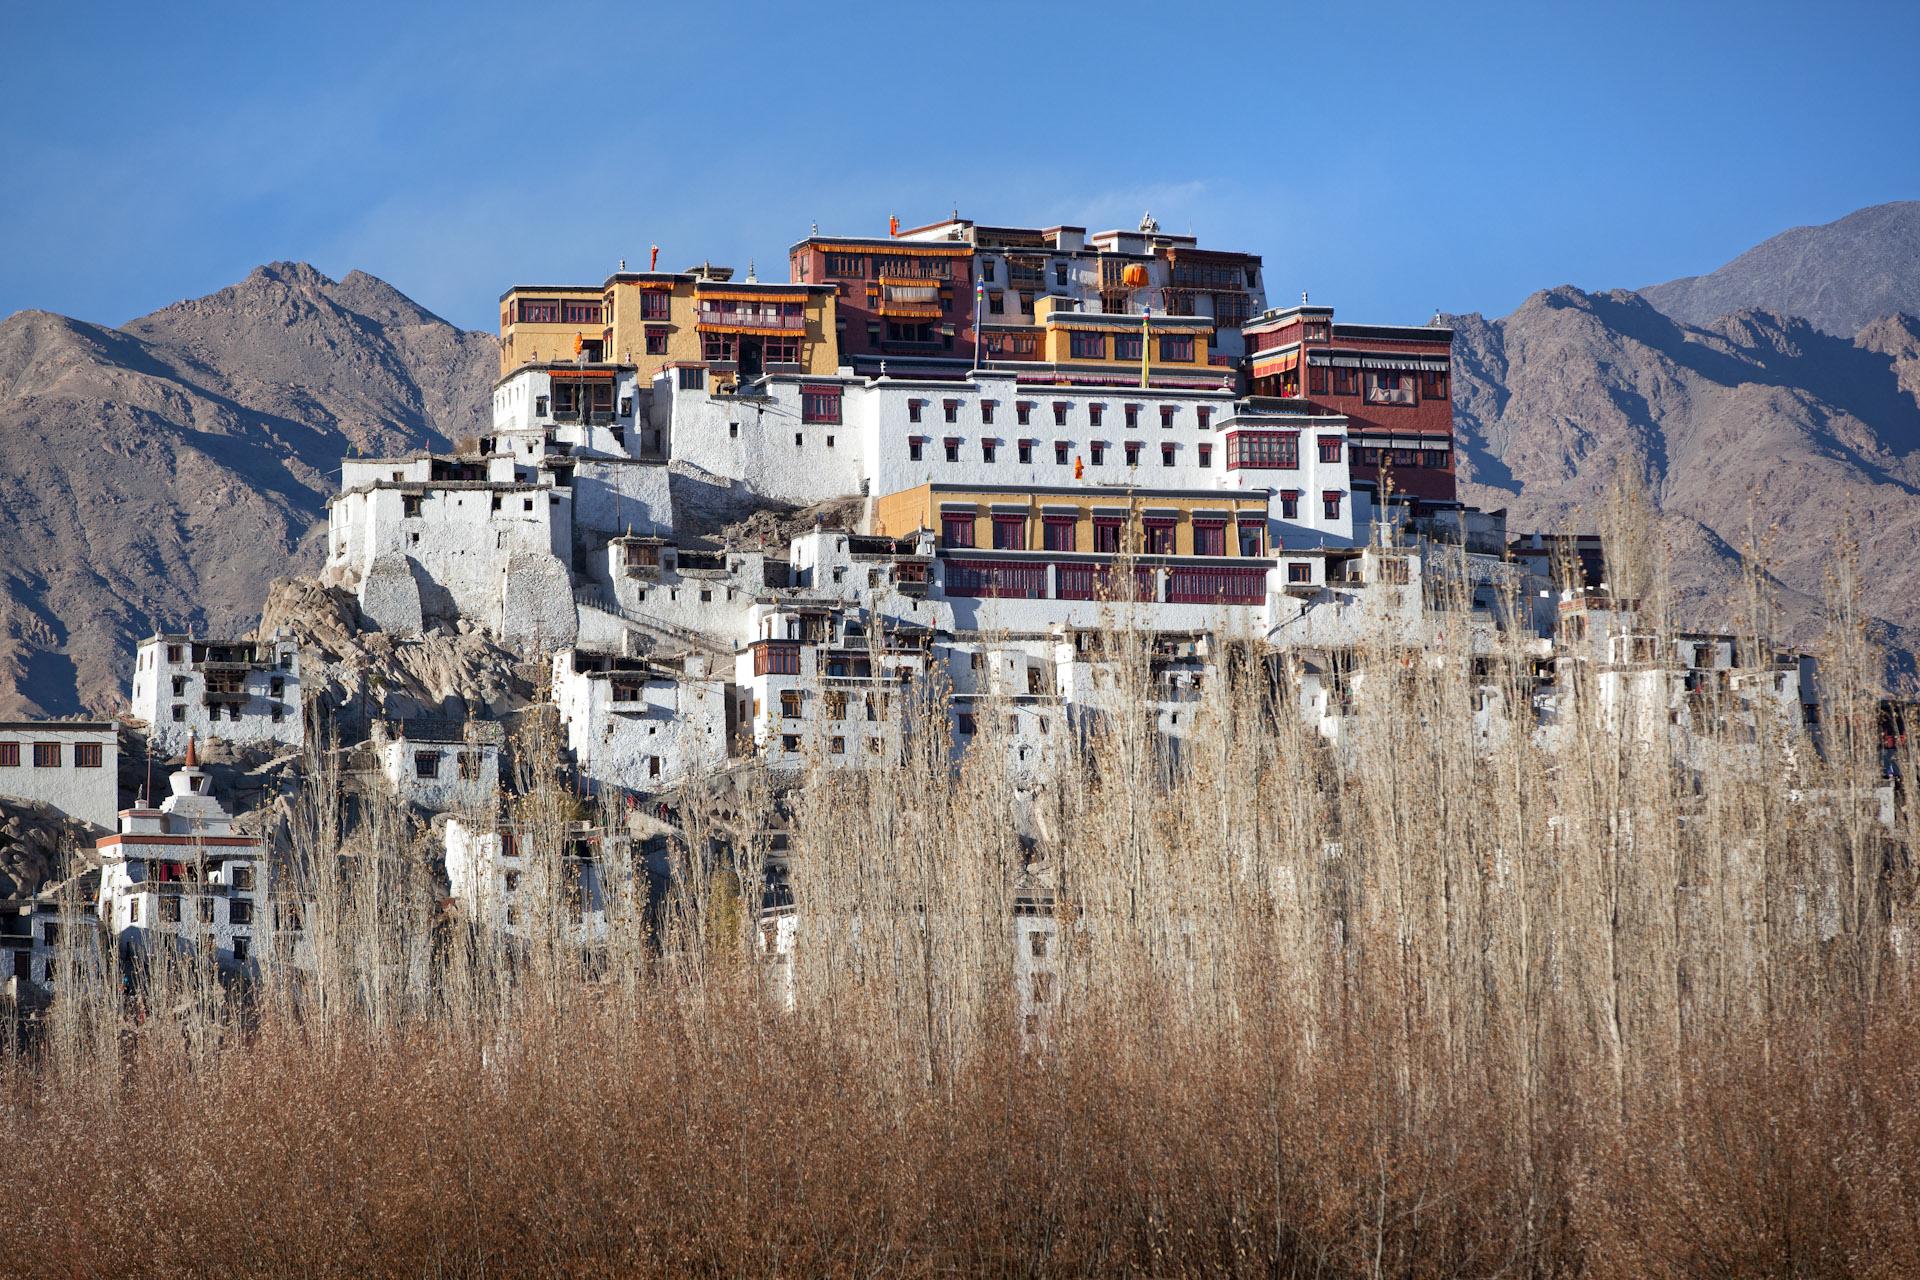 Jason_Bax_Travel_India-Ladakh-Thiksey-Buddhist-Monastery-2.JPG